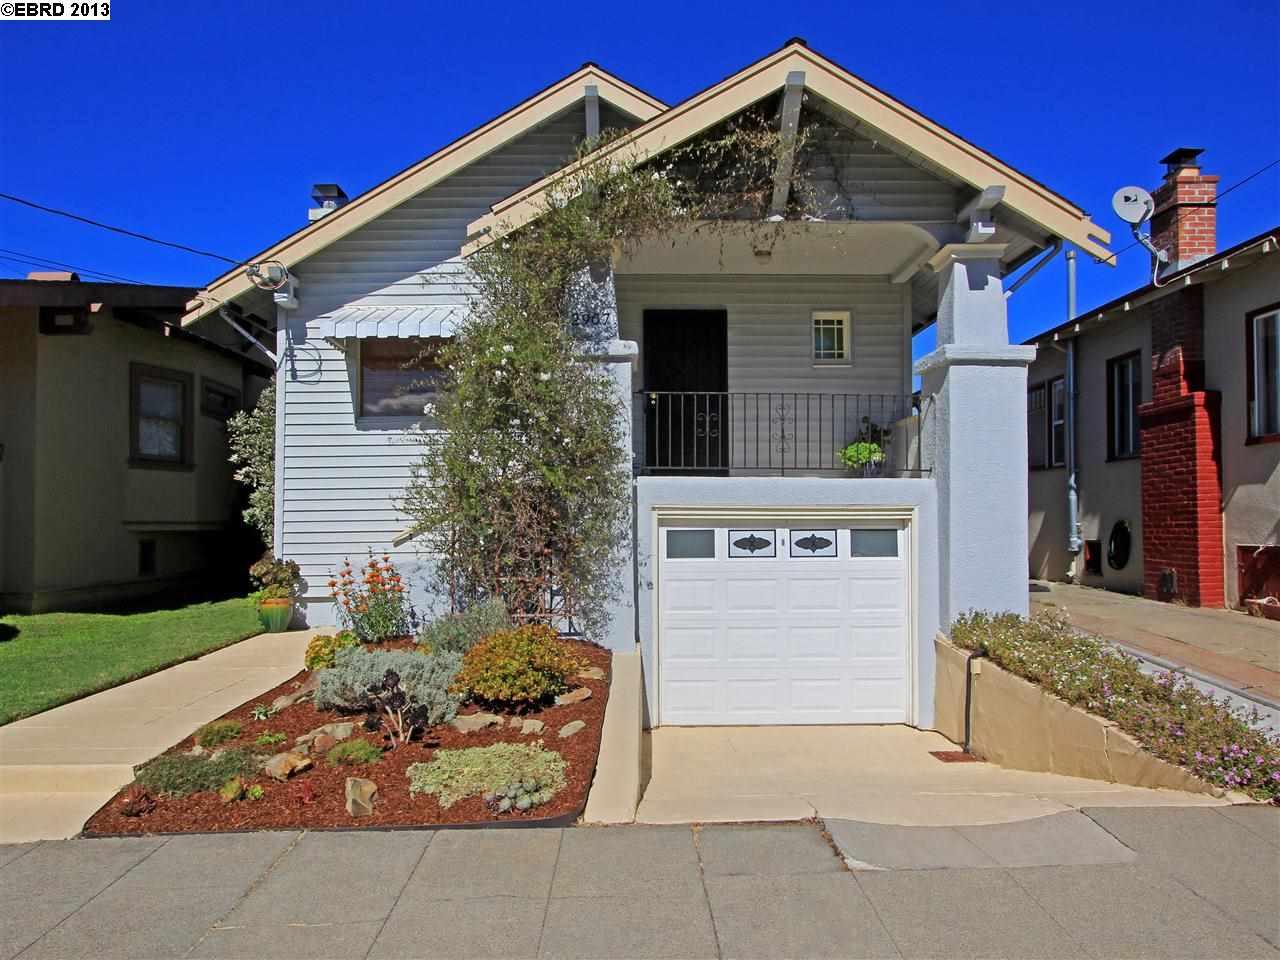 Single Family Home for Sale at 2907 MINNA Avenue Oakland, California 94619 United States